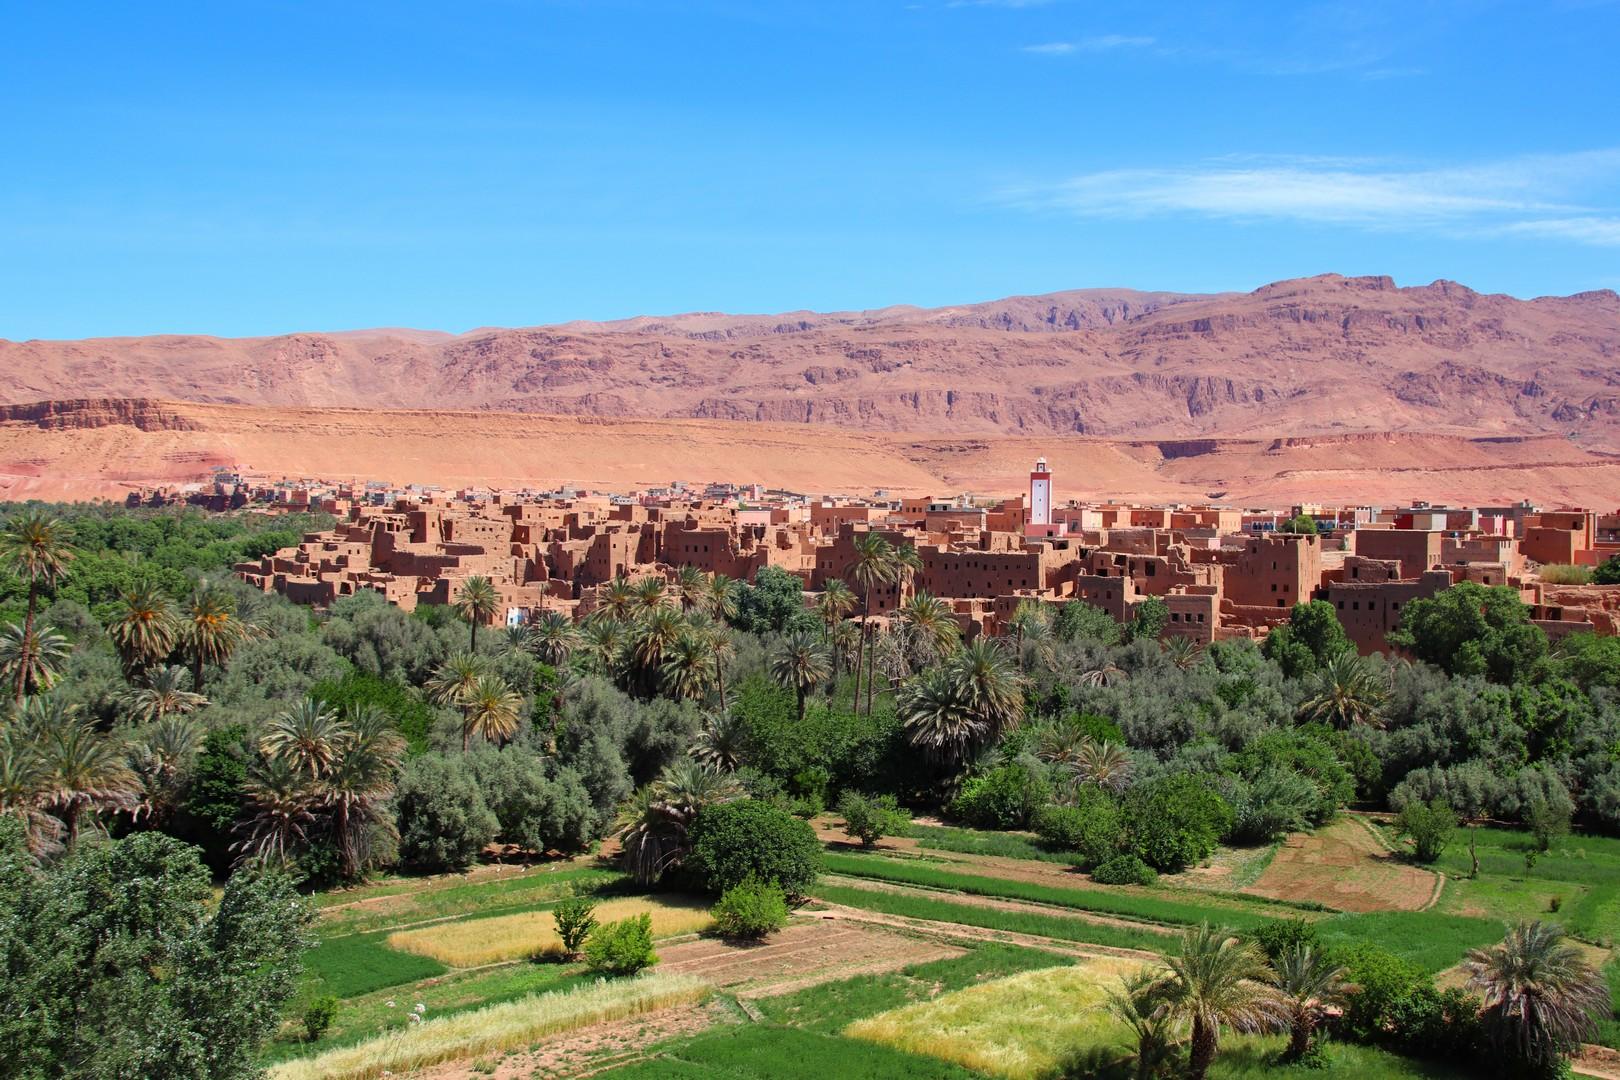 Maroc - Cultures dans la palmeraie de Tineghir